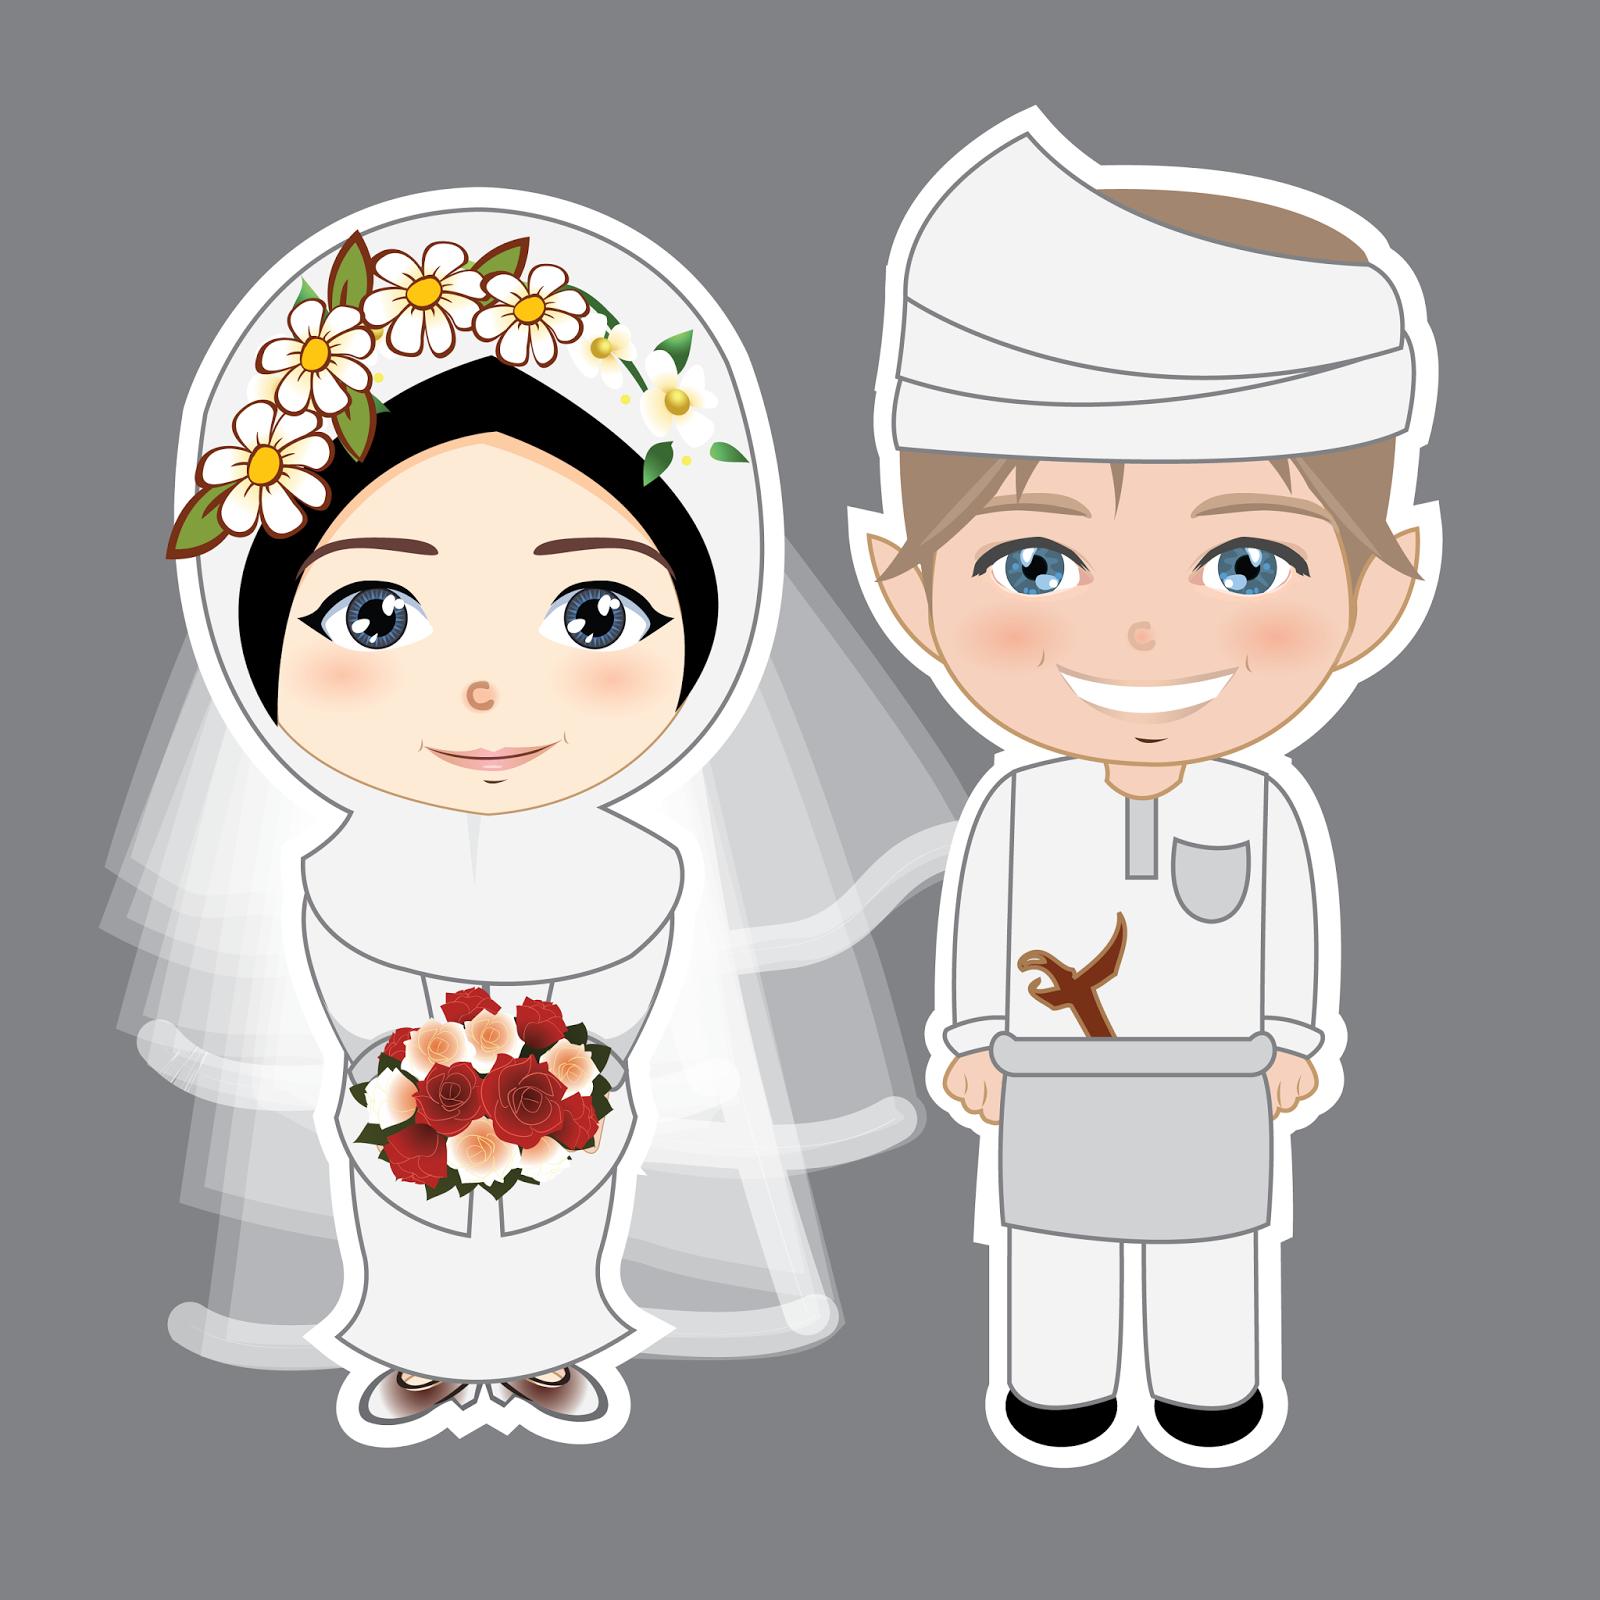 Gambar Gambar Kartun Muslimah Nikah Bliblinews Islami Pernikahan